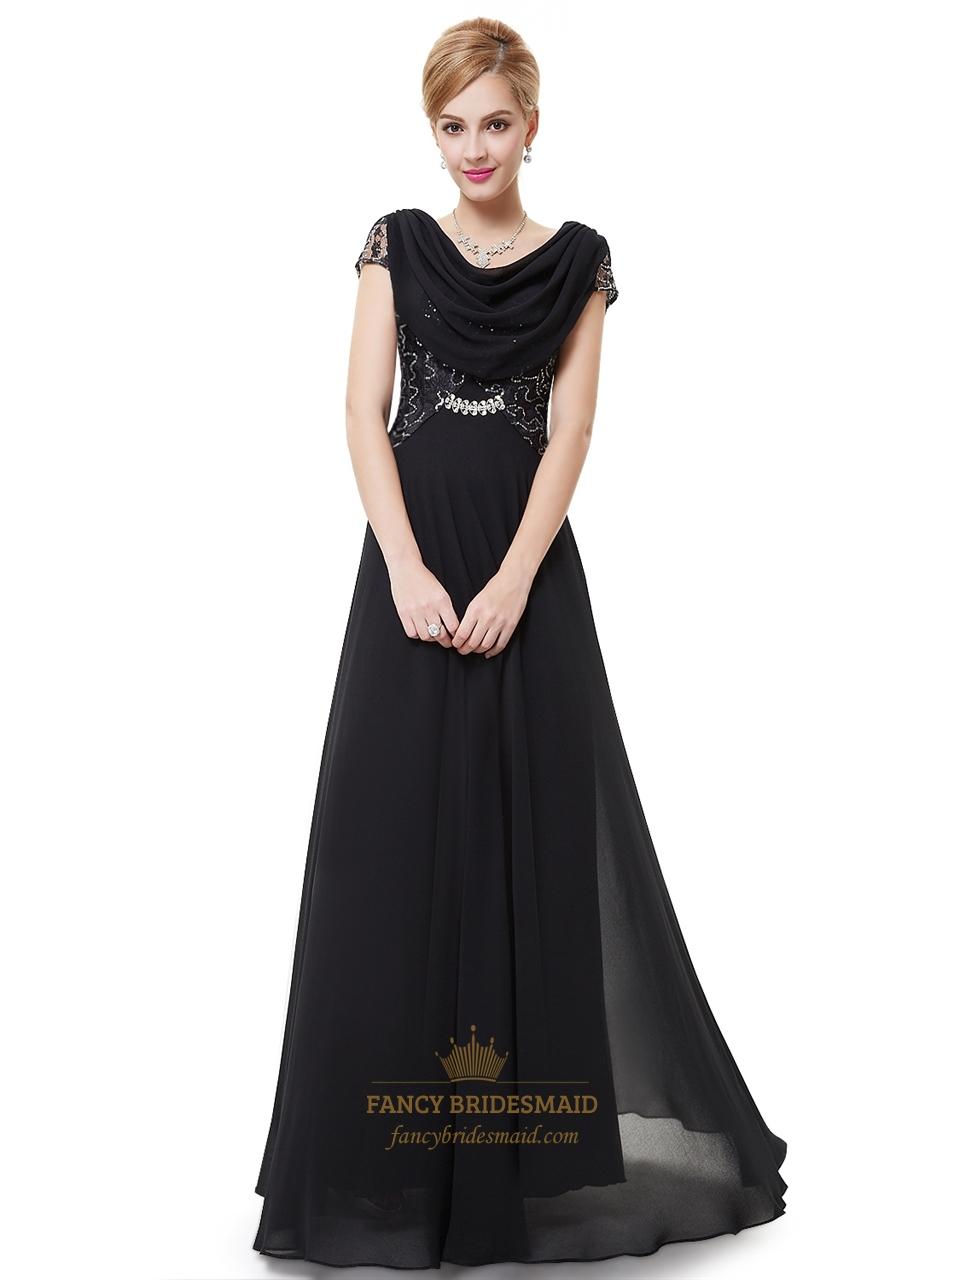 acdd73dbd0ab Black Chiffon Cap Sleeves Cowl Back Prom Dress With Lace Bodice SKU -NW1530